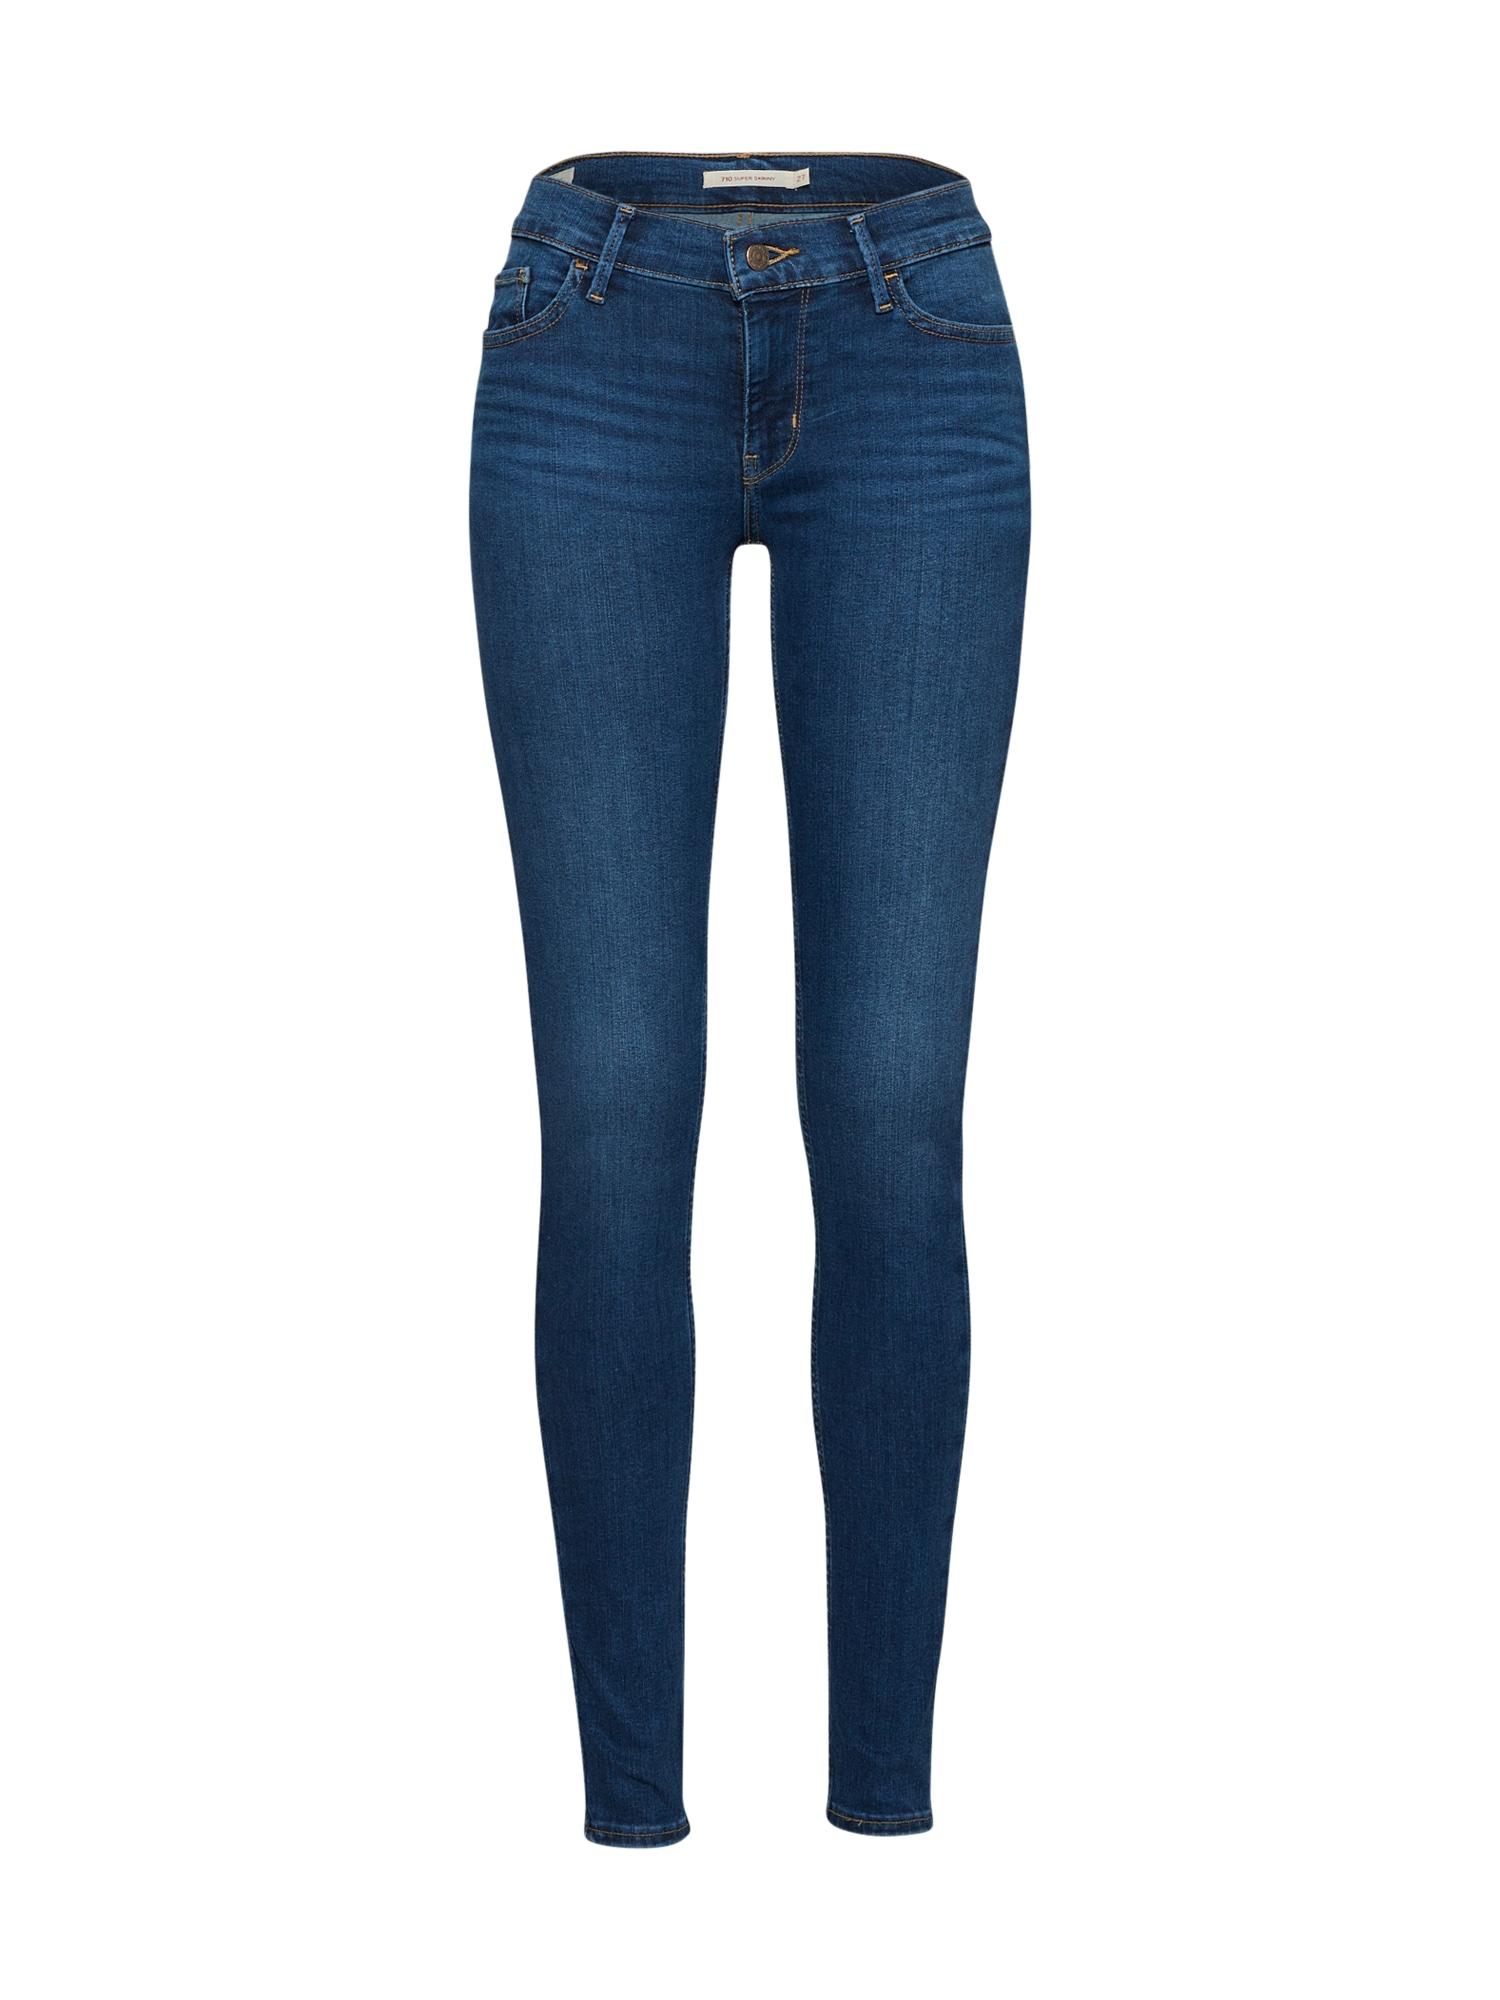 LEVI'S Dames Jeans 710 Innovation Super Skinny blauw denim